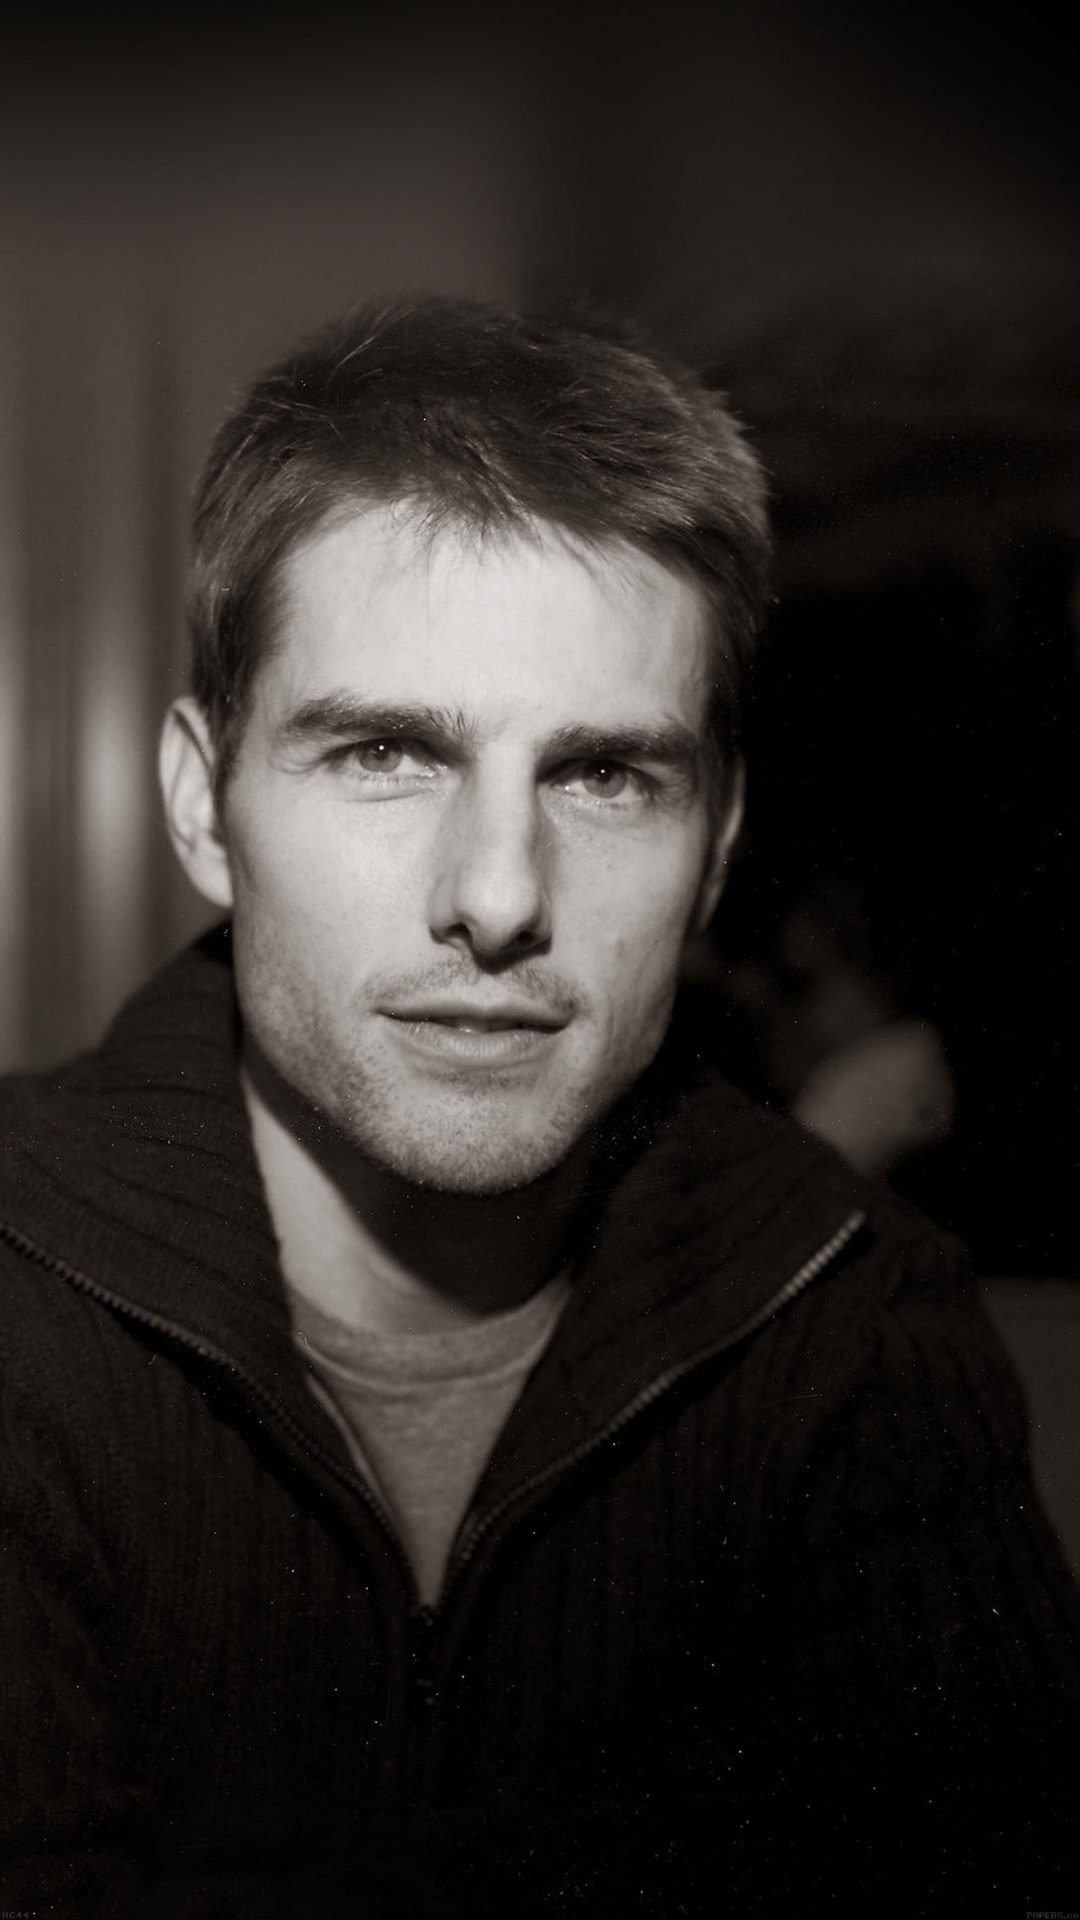 Tom Cruise Vanilla Sky Portrait Celebrity